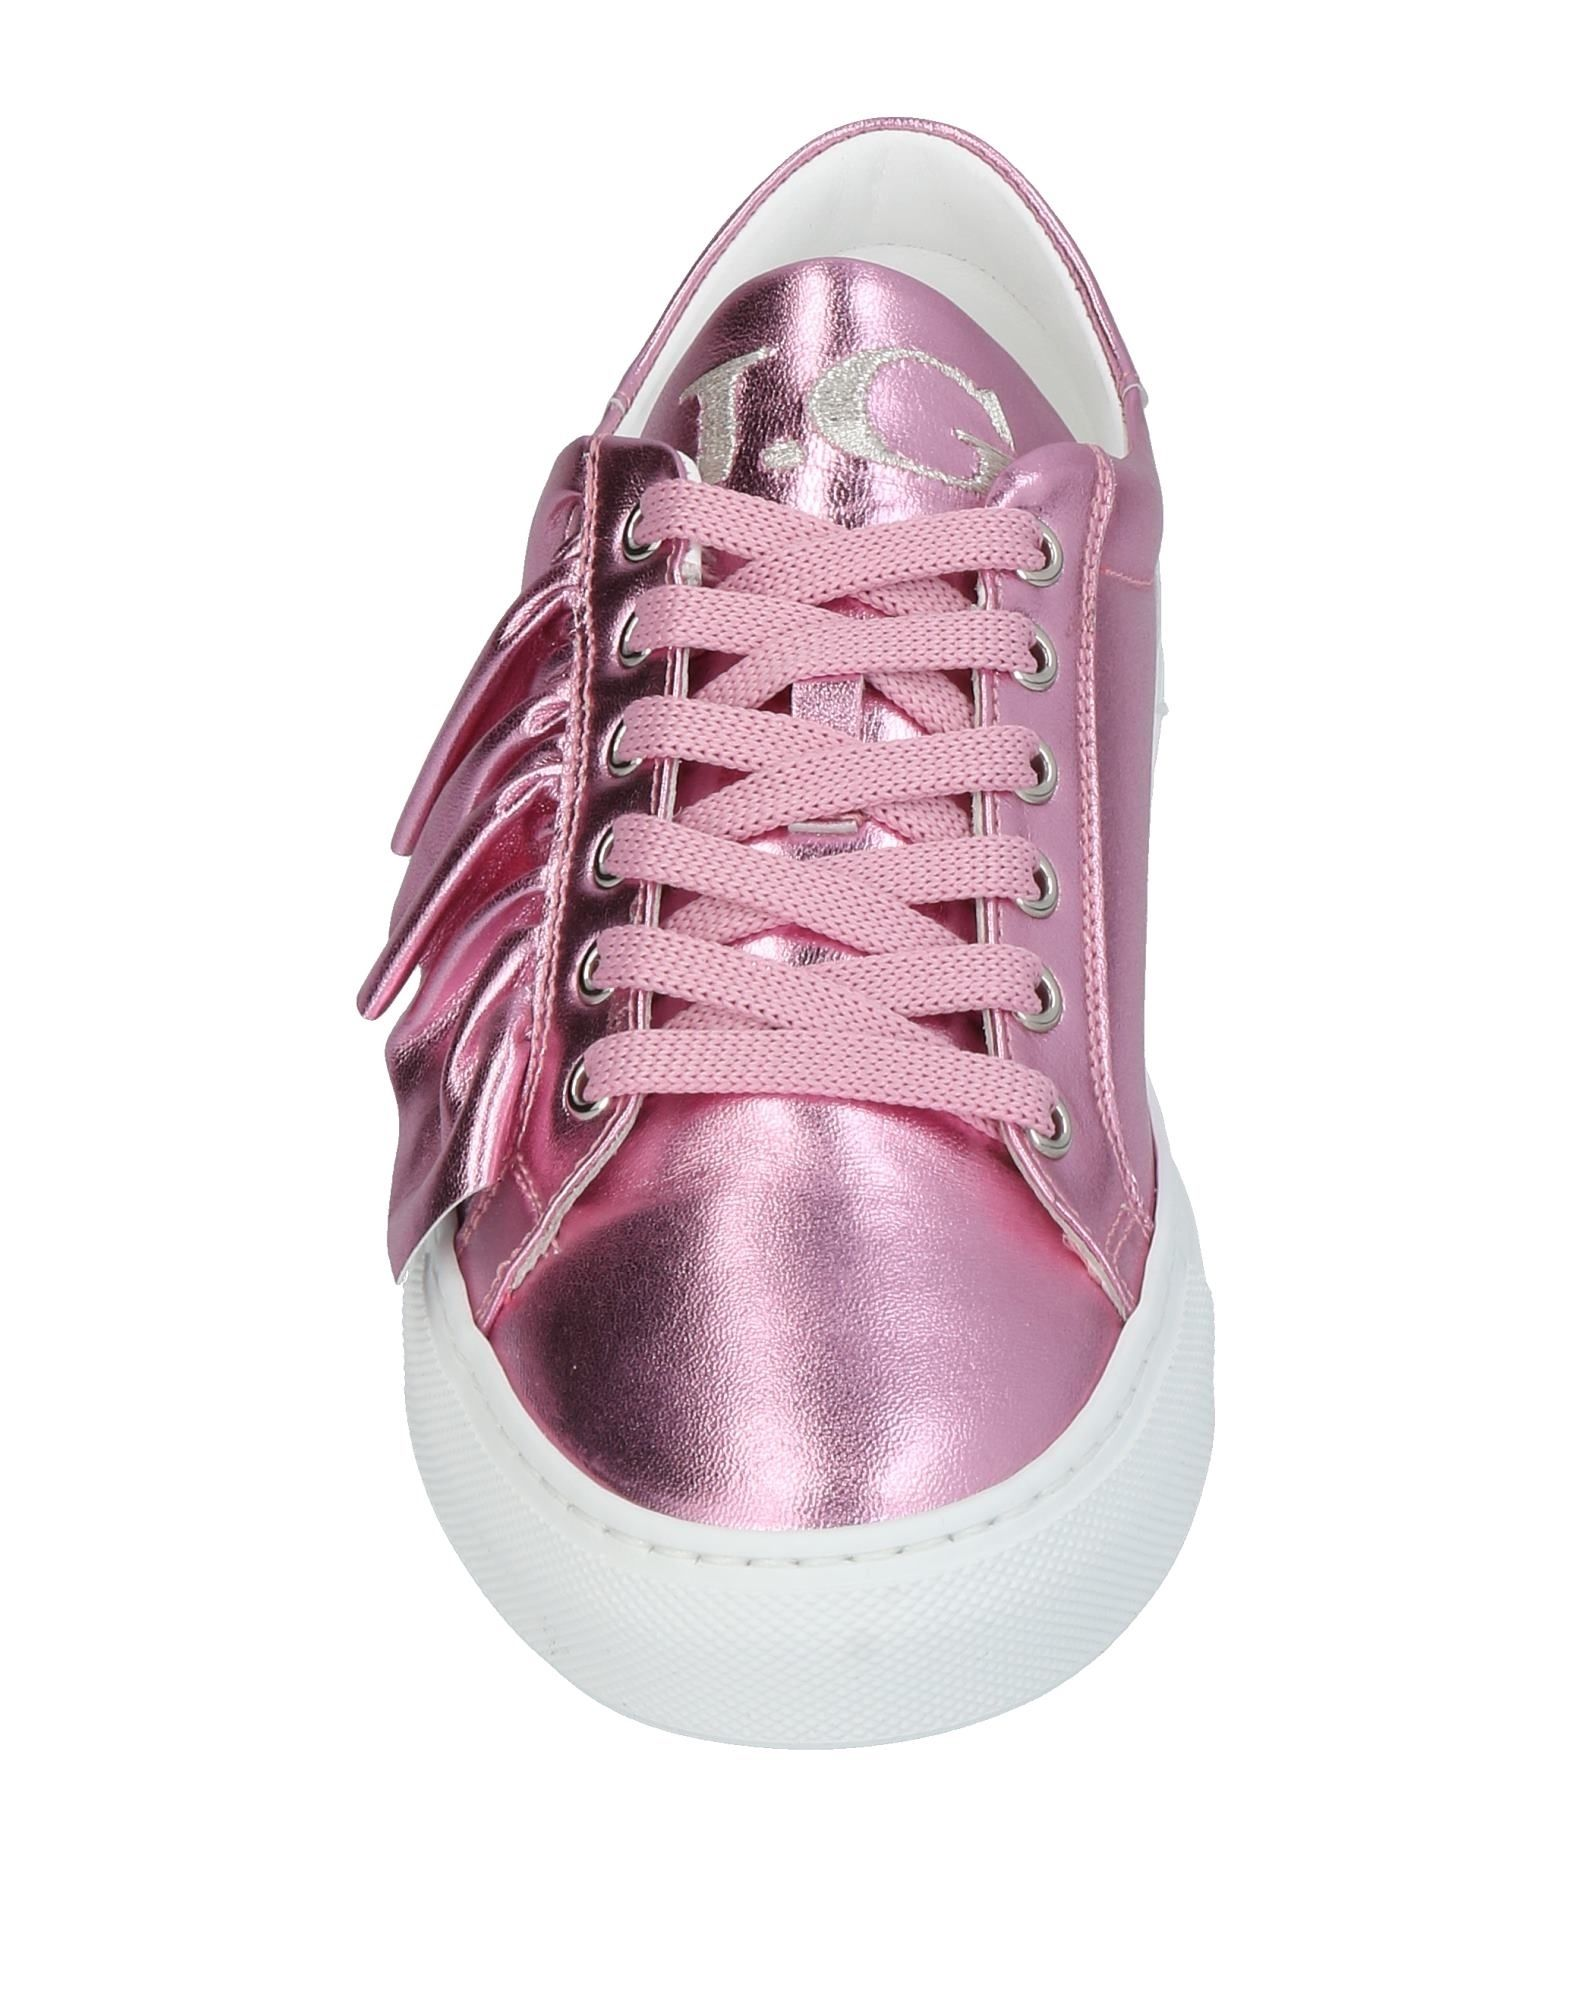 John Galliano Sneakers Damen  11426477WW Gute Qualität beliebte Schuhe